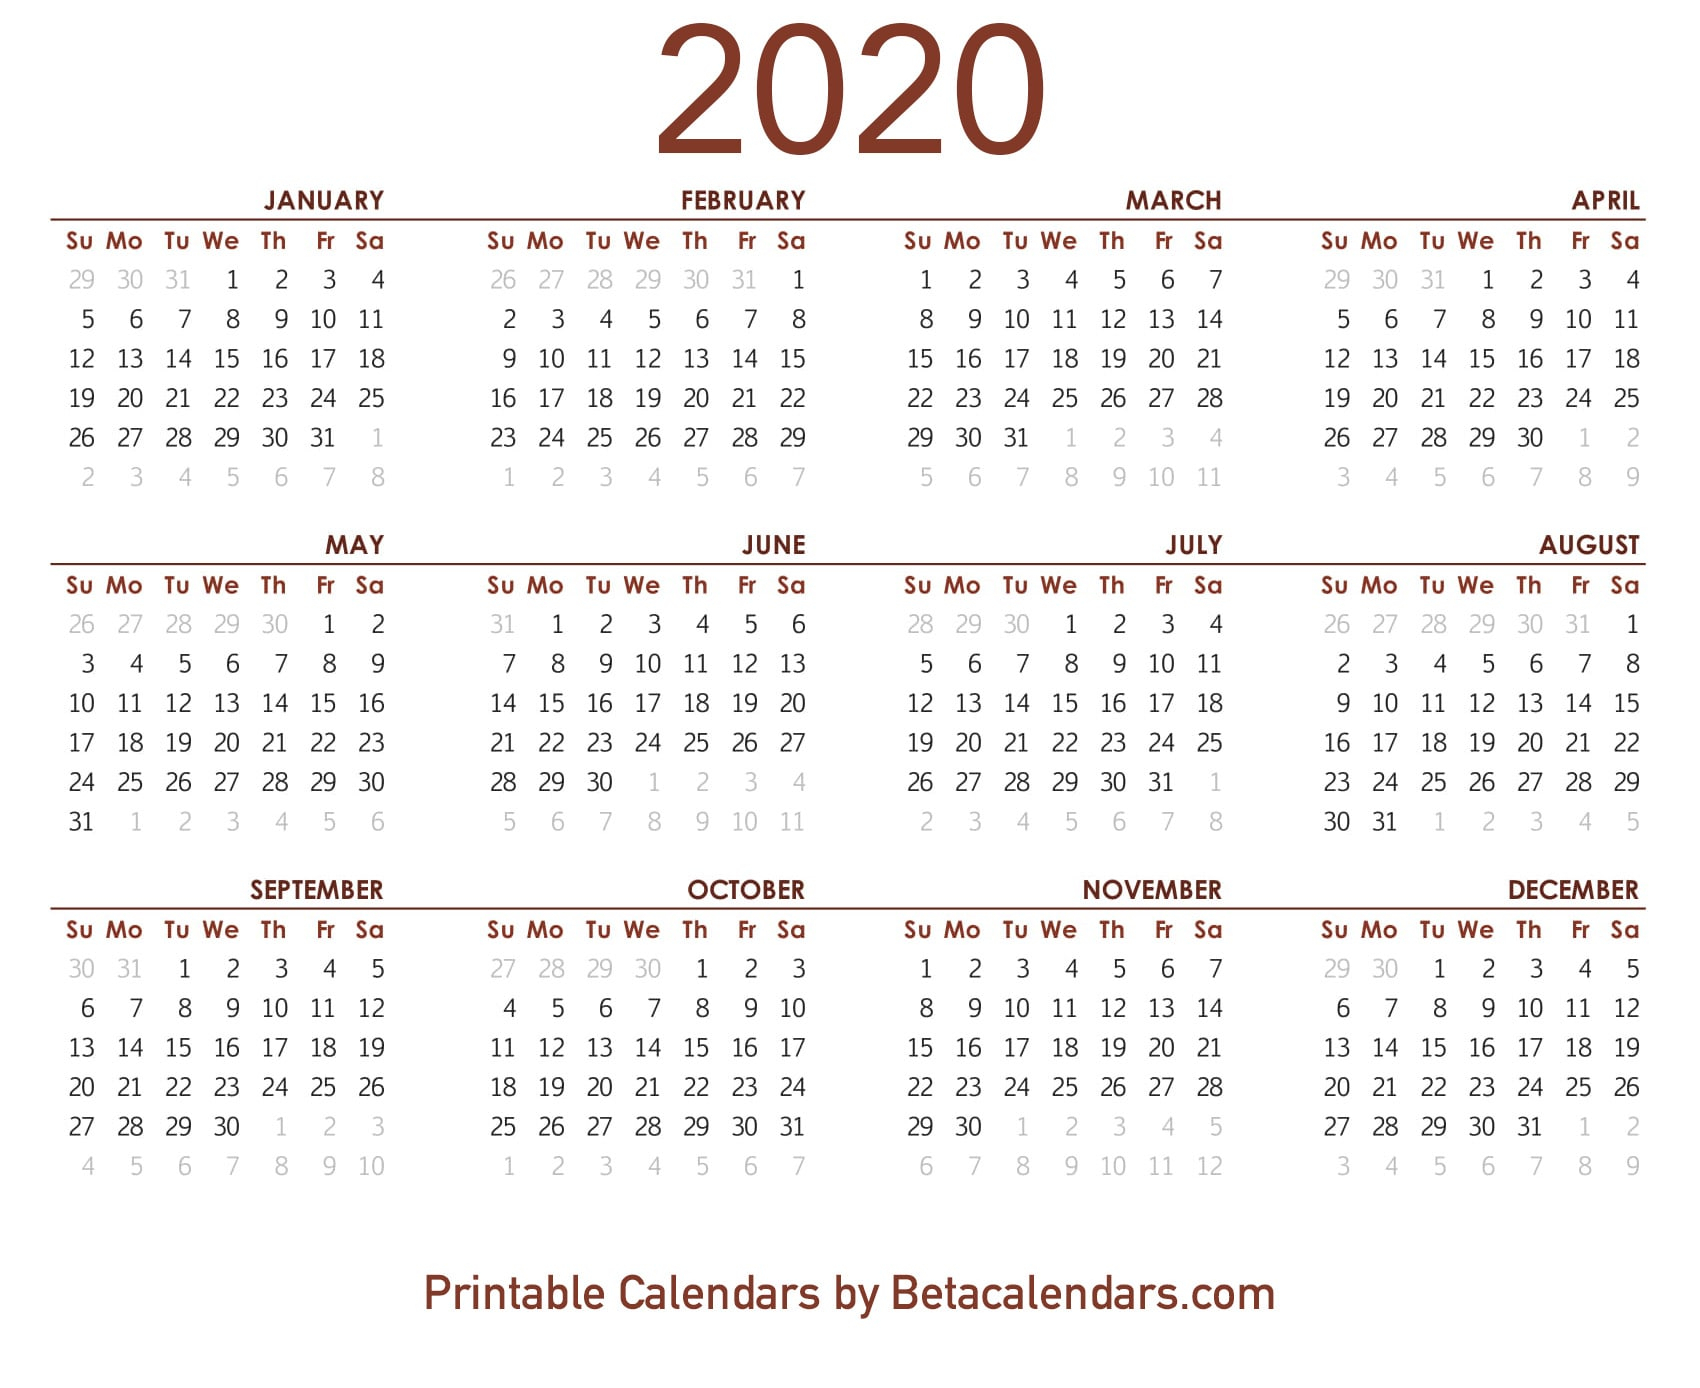 2020 Calendar  Free Printable Yearly Calendar 2020 intended for December 2020 Calendar Beta Calendars